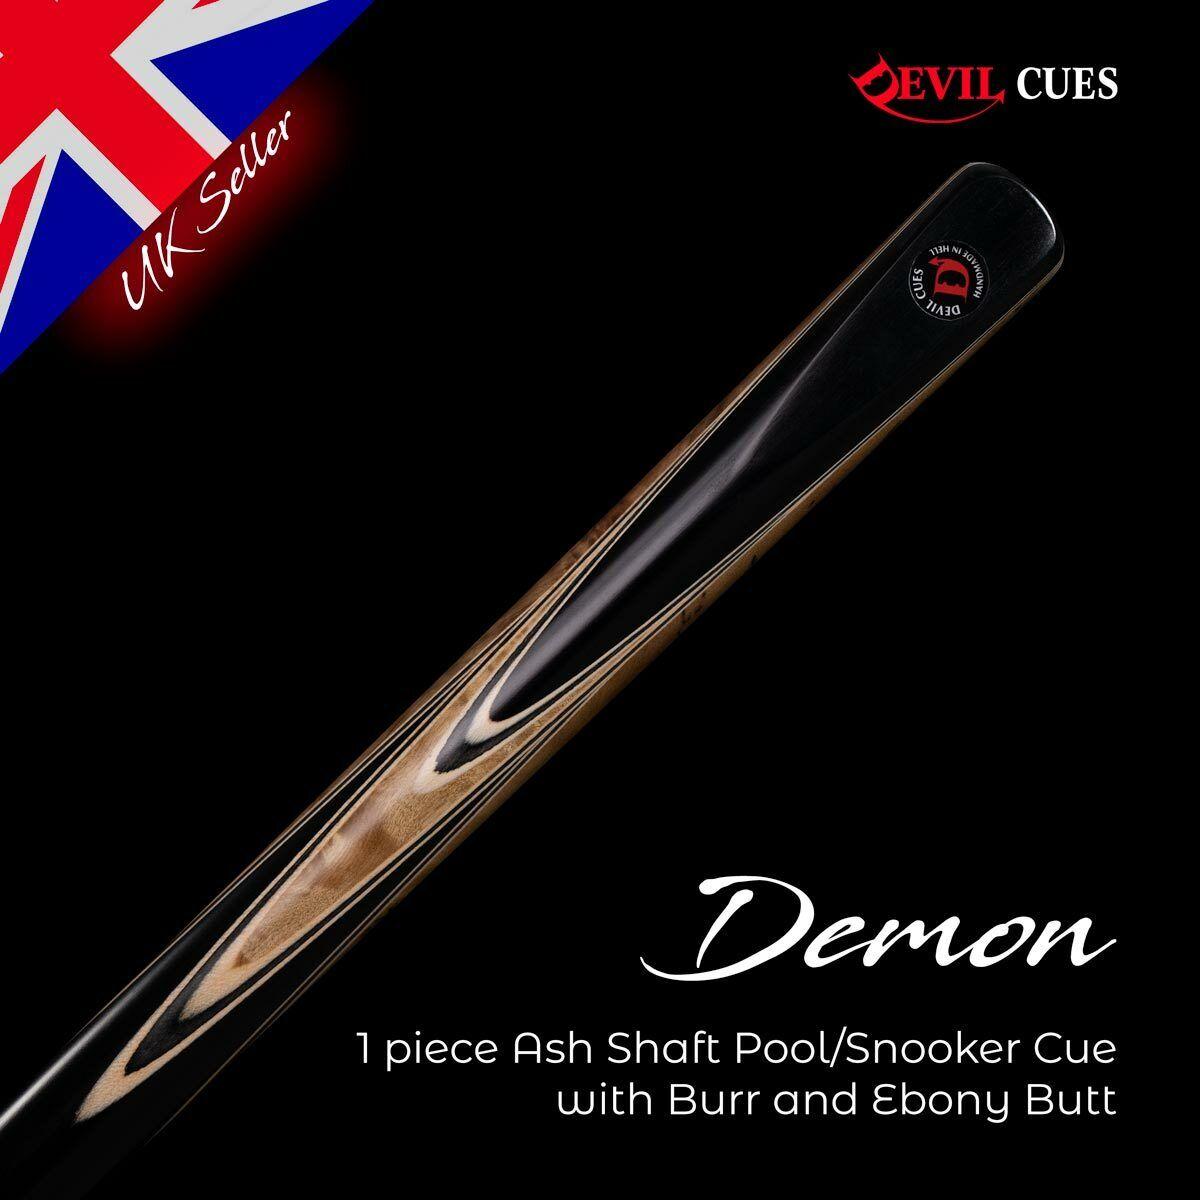 Devil Cue 'Demon' 57